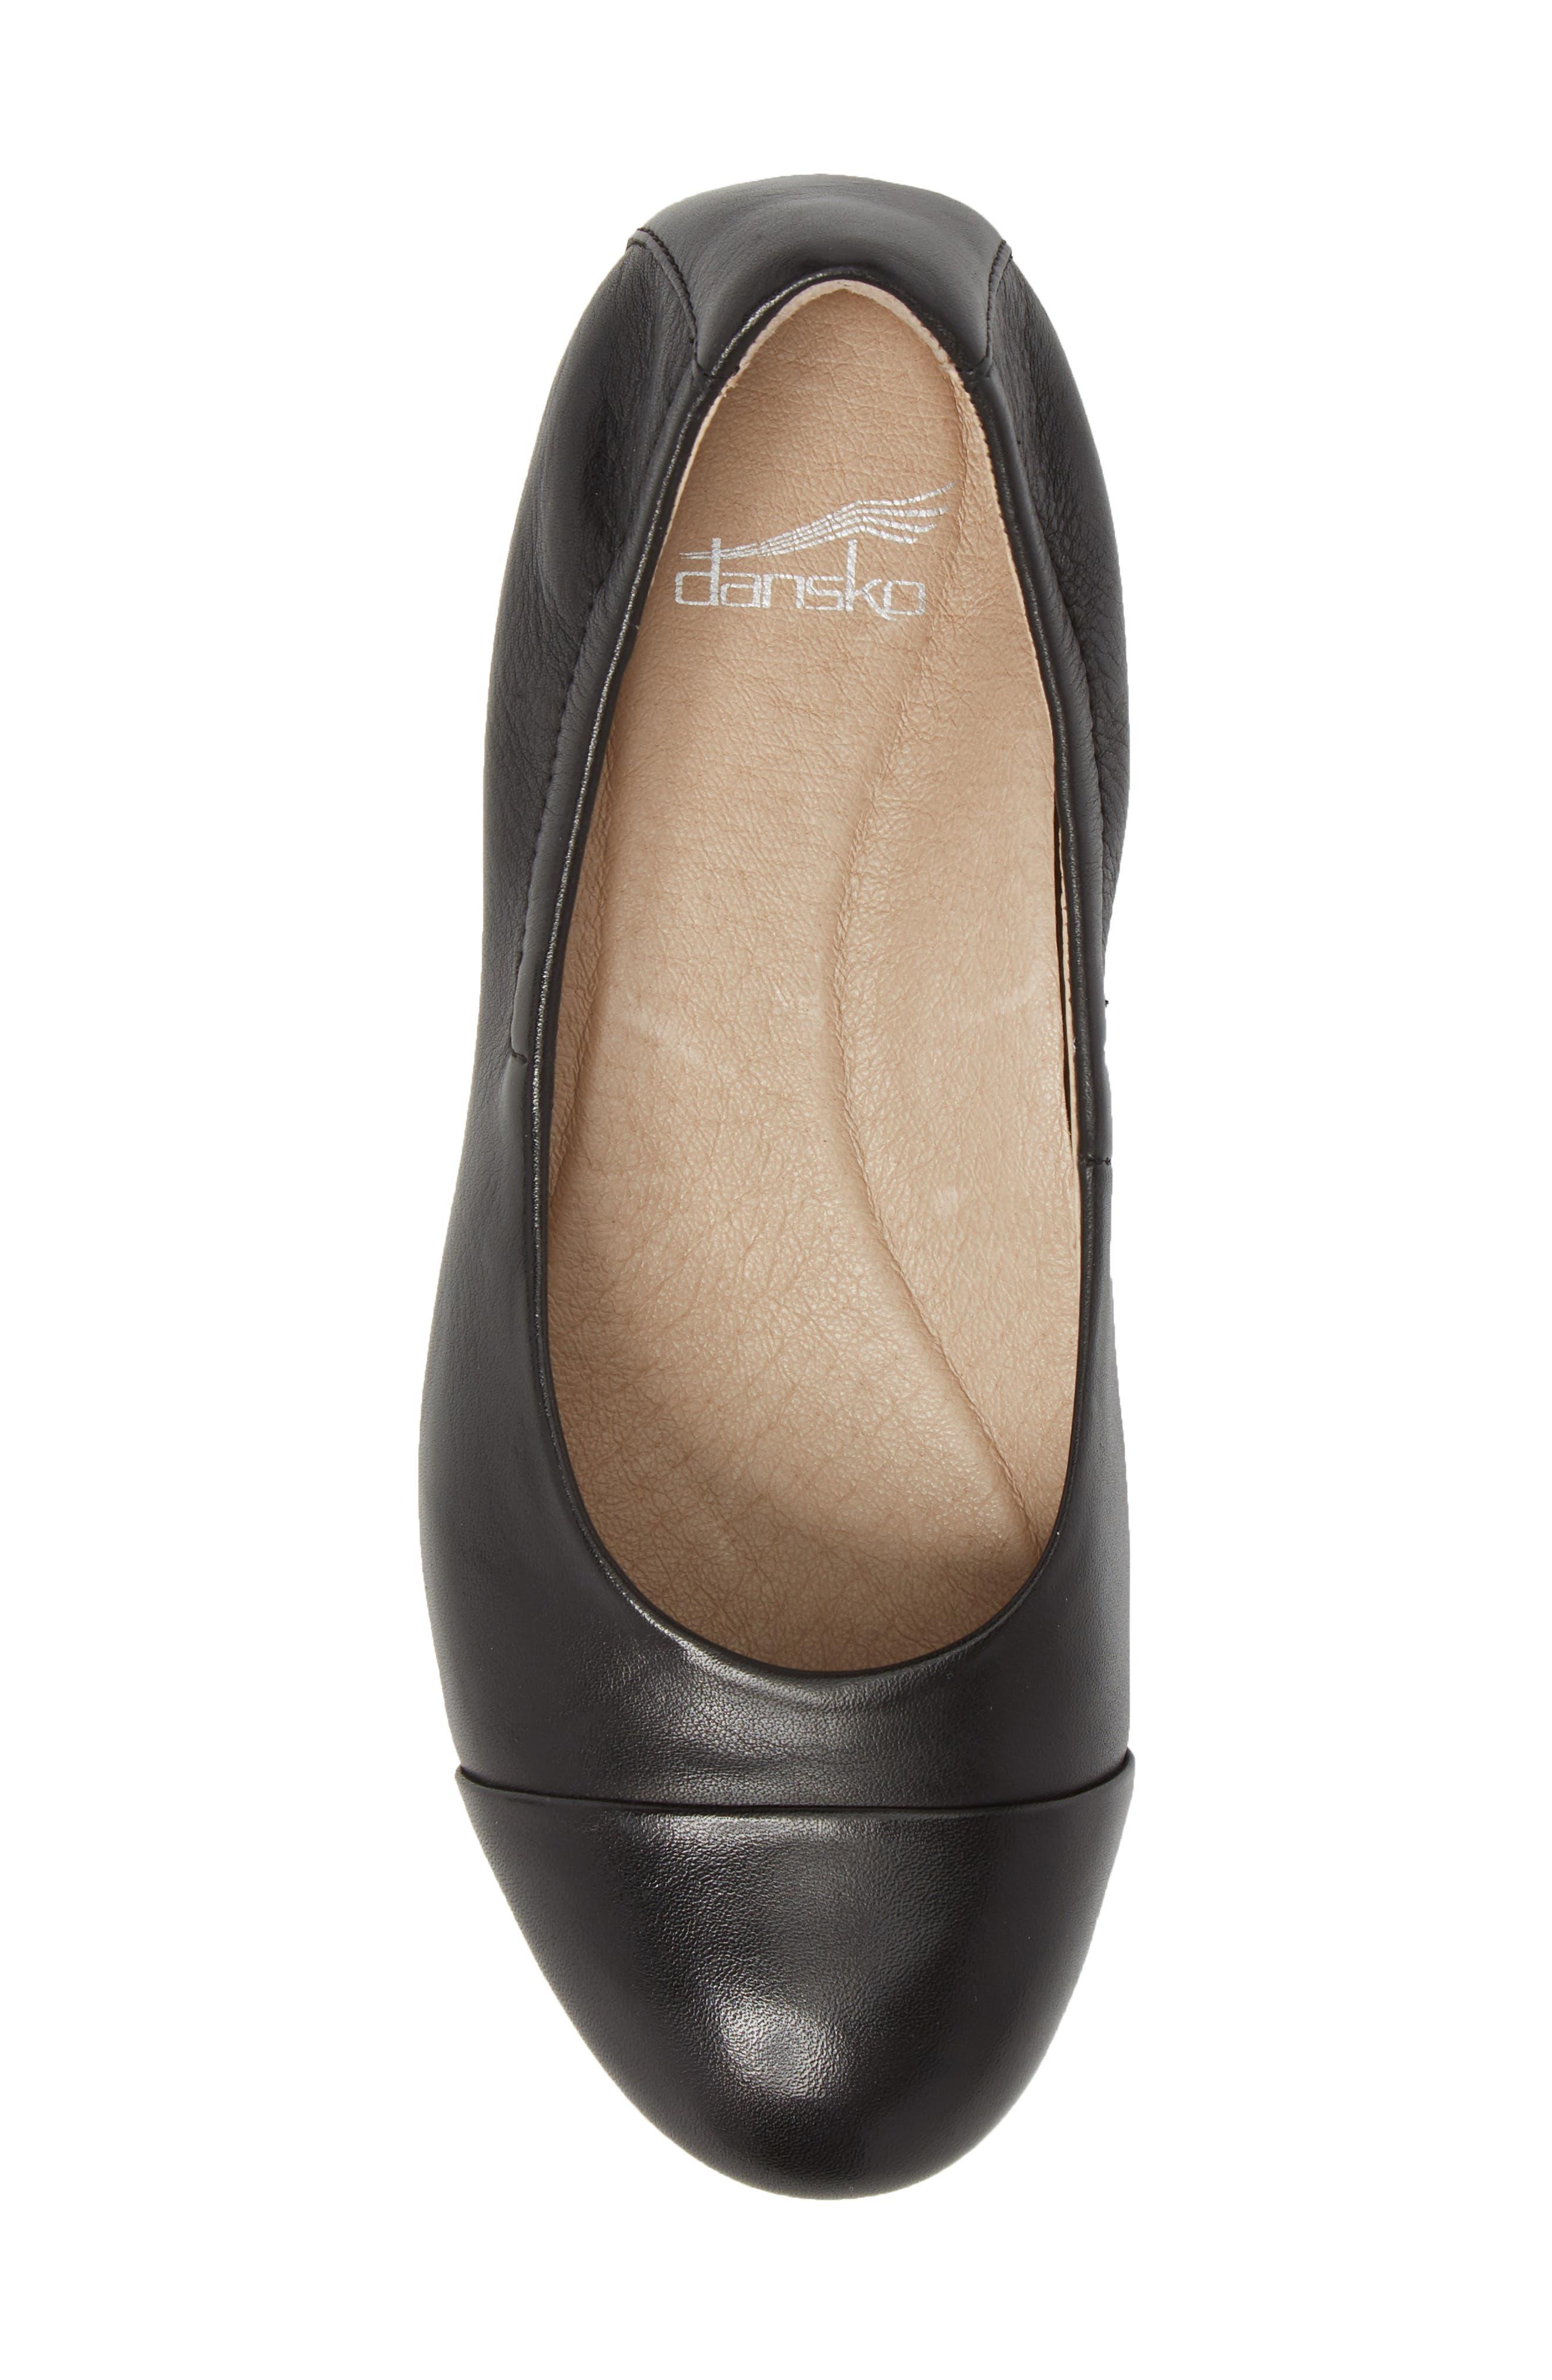 Lisanne Cap Toe Ballet Flat,                             Alternate thumbnail 5, color,                             BLACK MILLED LEATHER